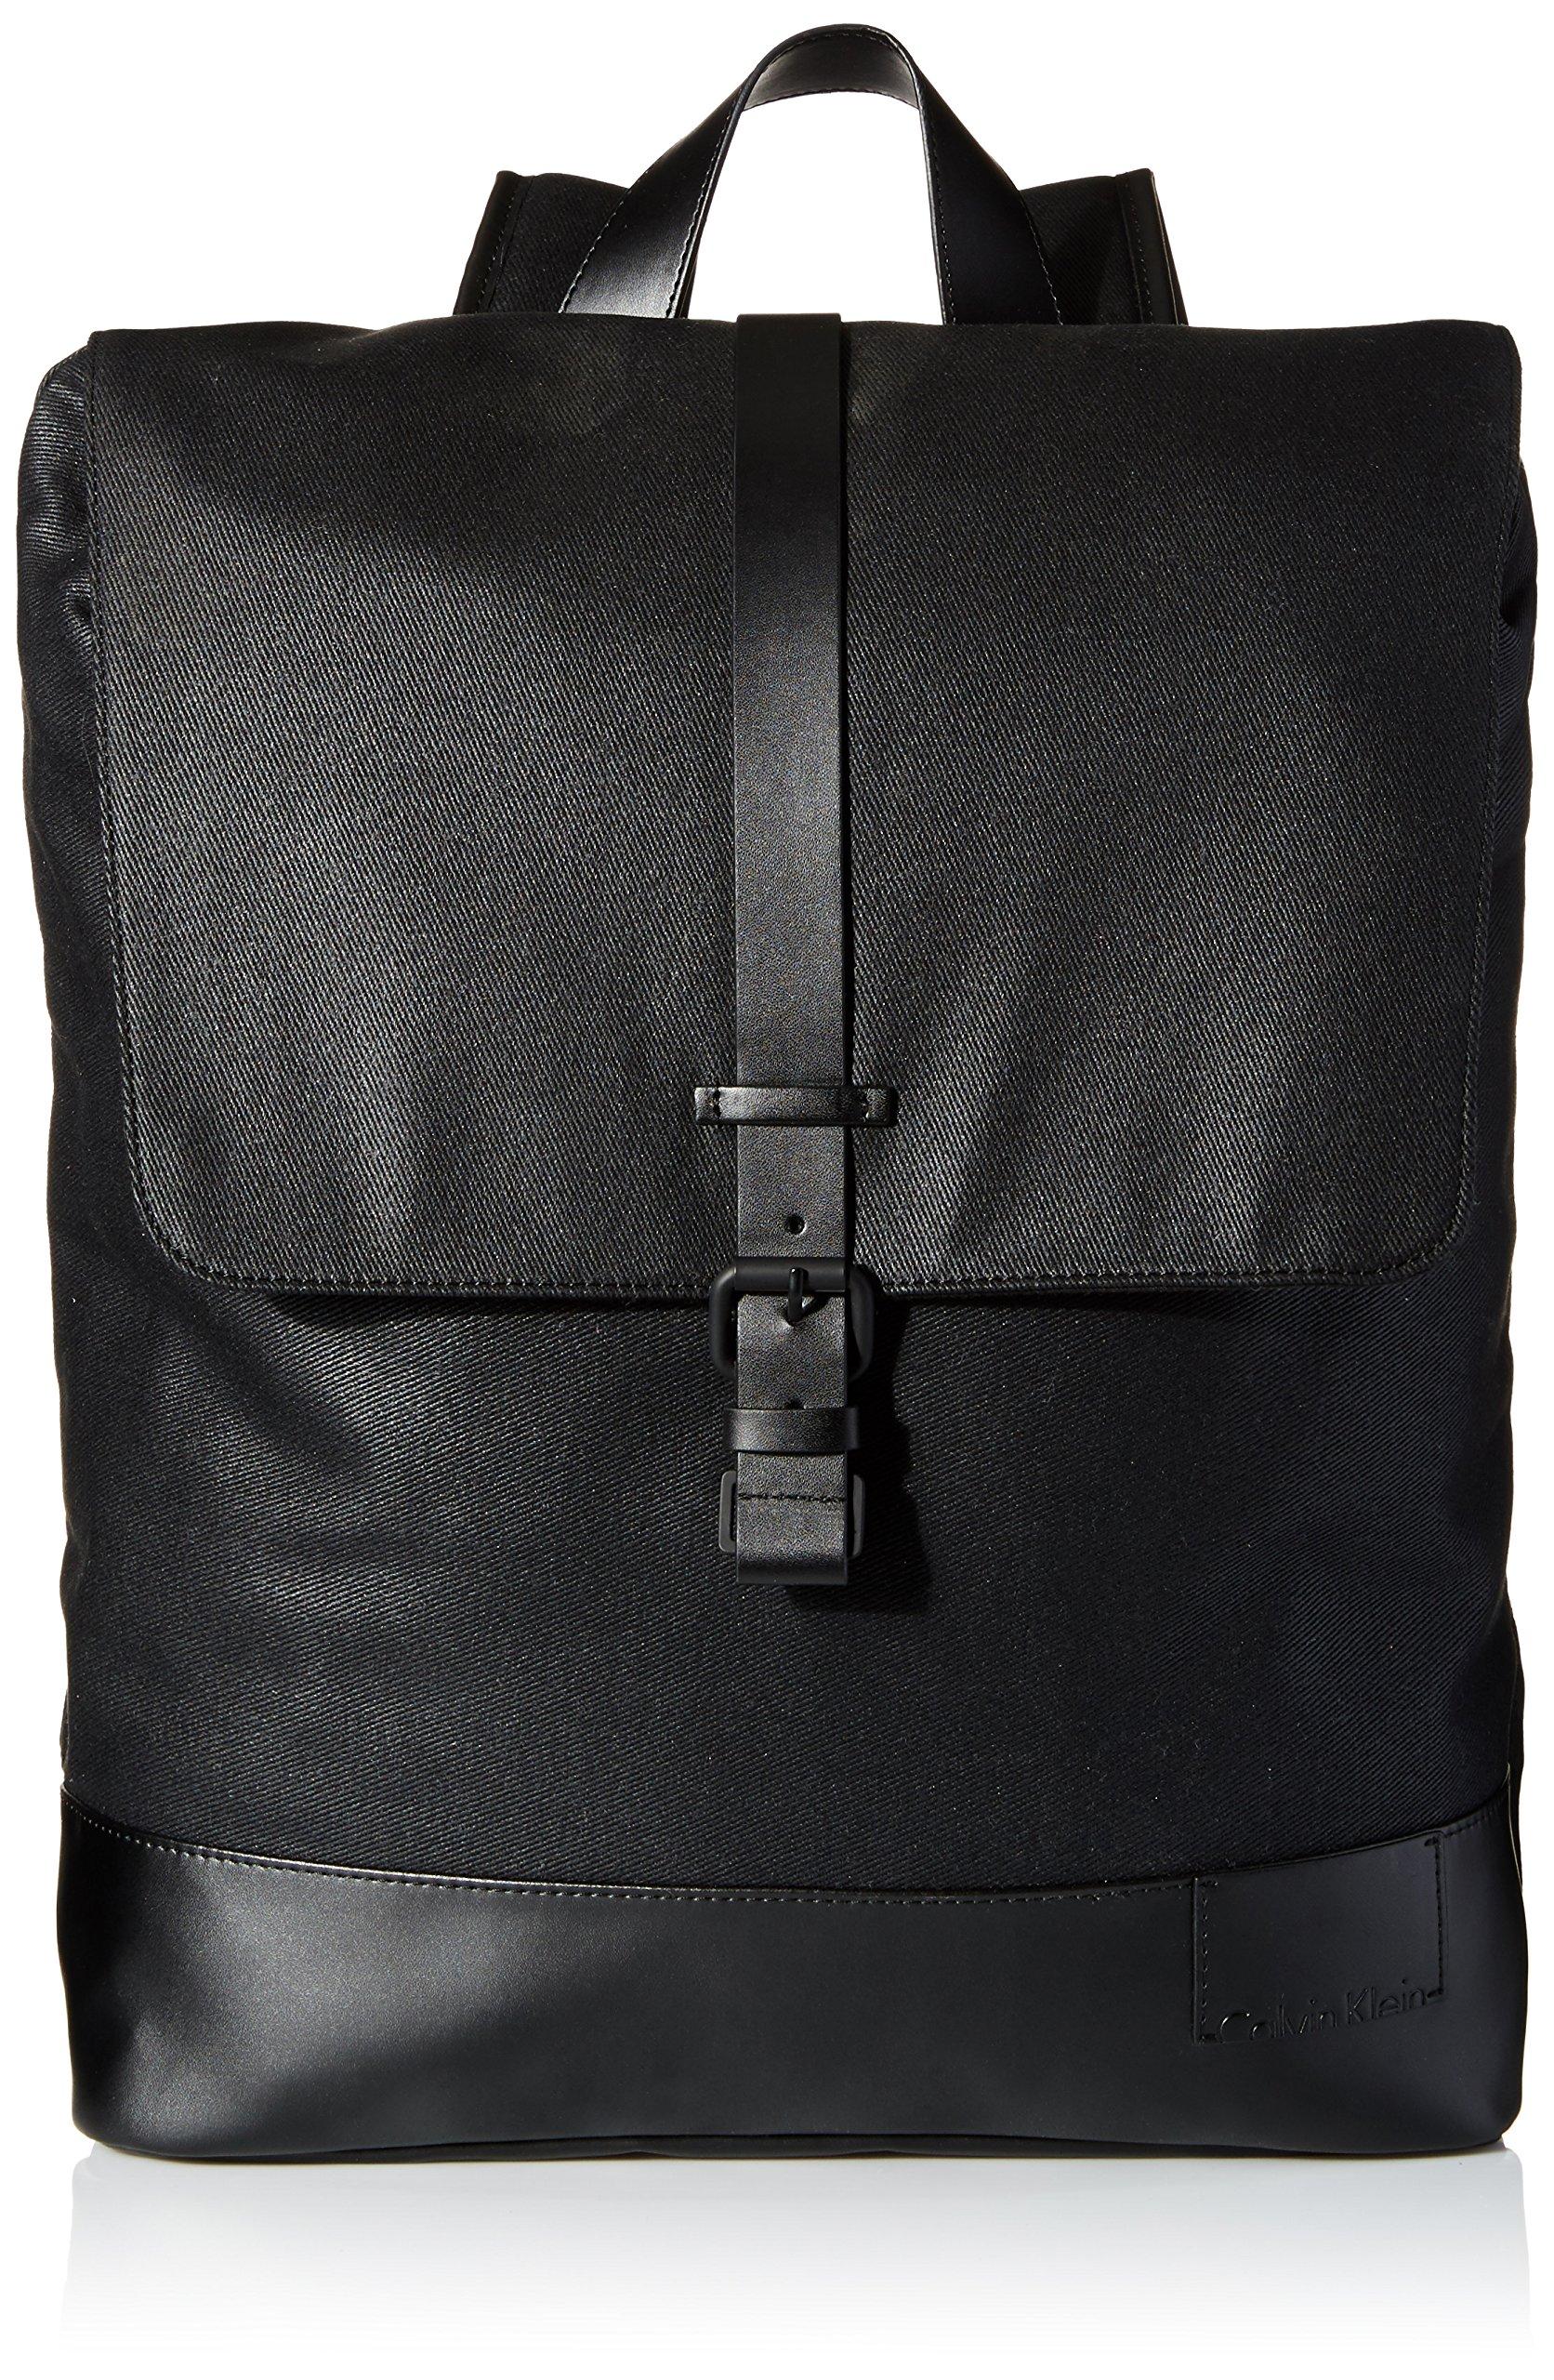 Calvin Klein Men's Calvin Klein Coated Canvas Backpack, black, One Size